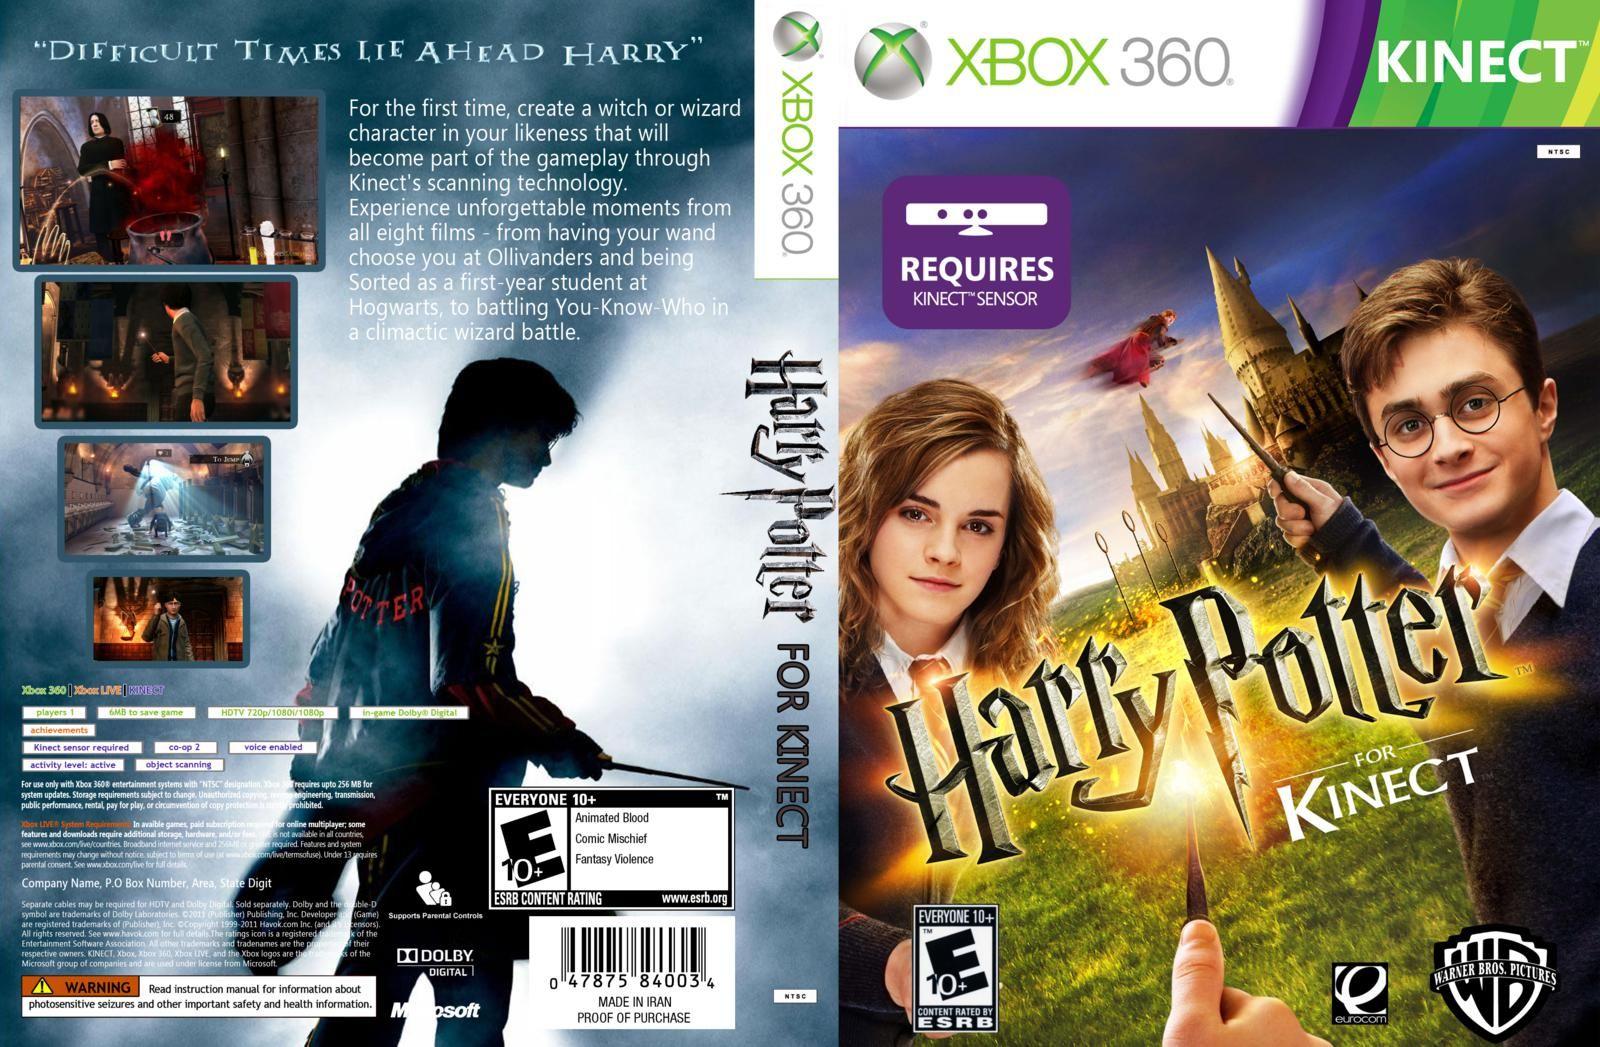 Harry Potter Kinect XBOX 360 Xbox kinect, Xbox, Kinect